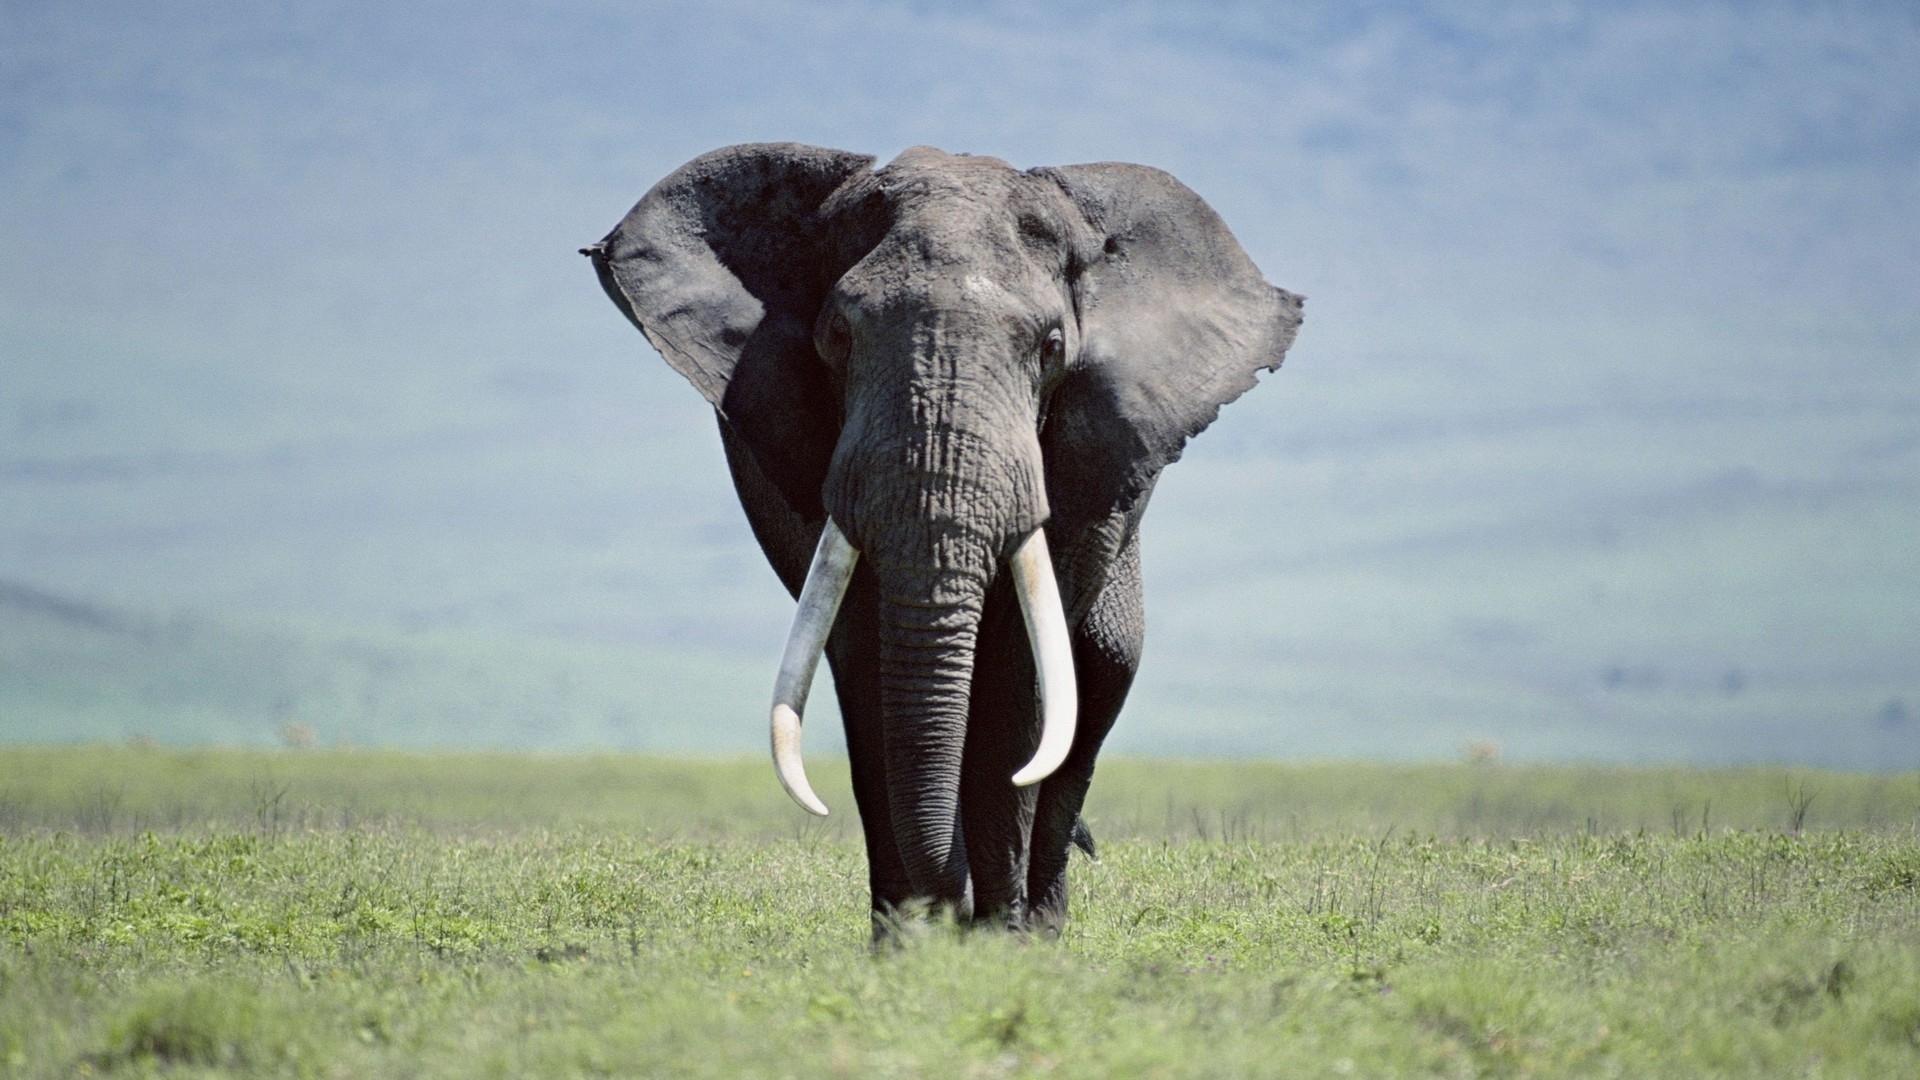 hd elephants